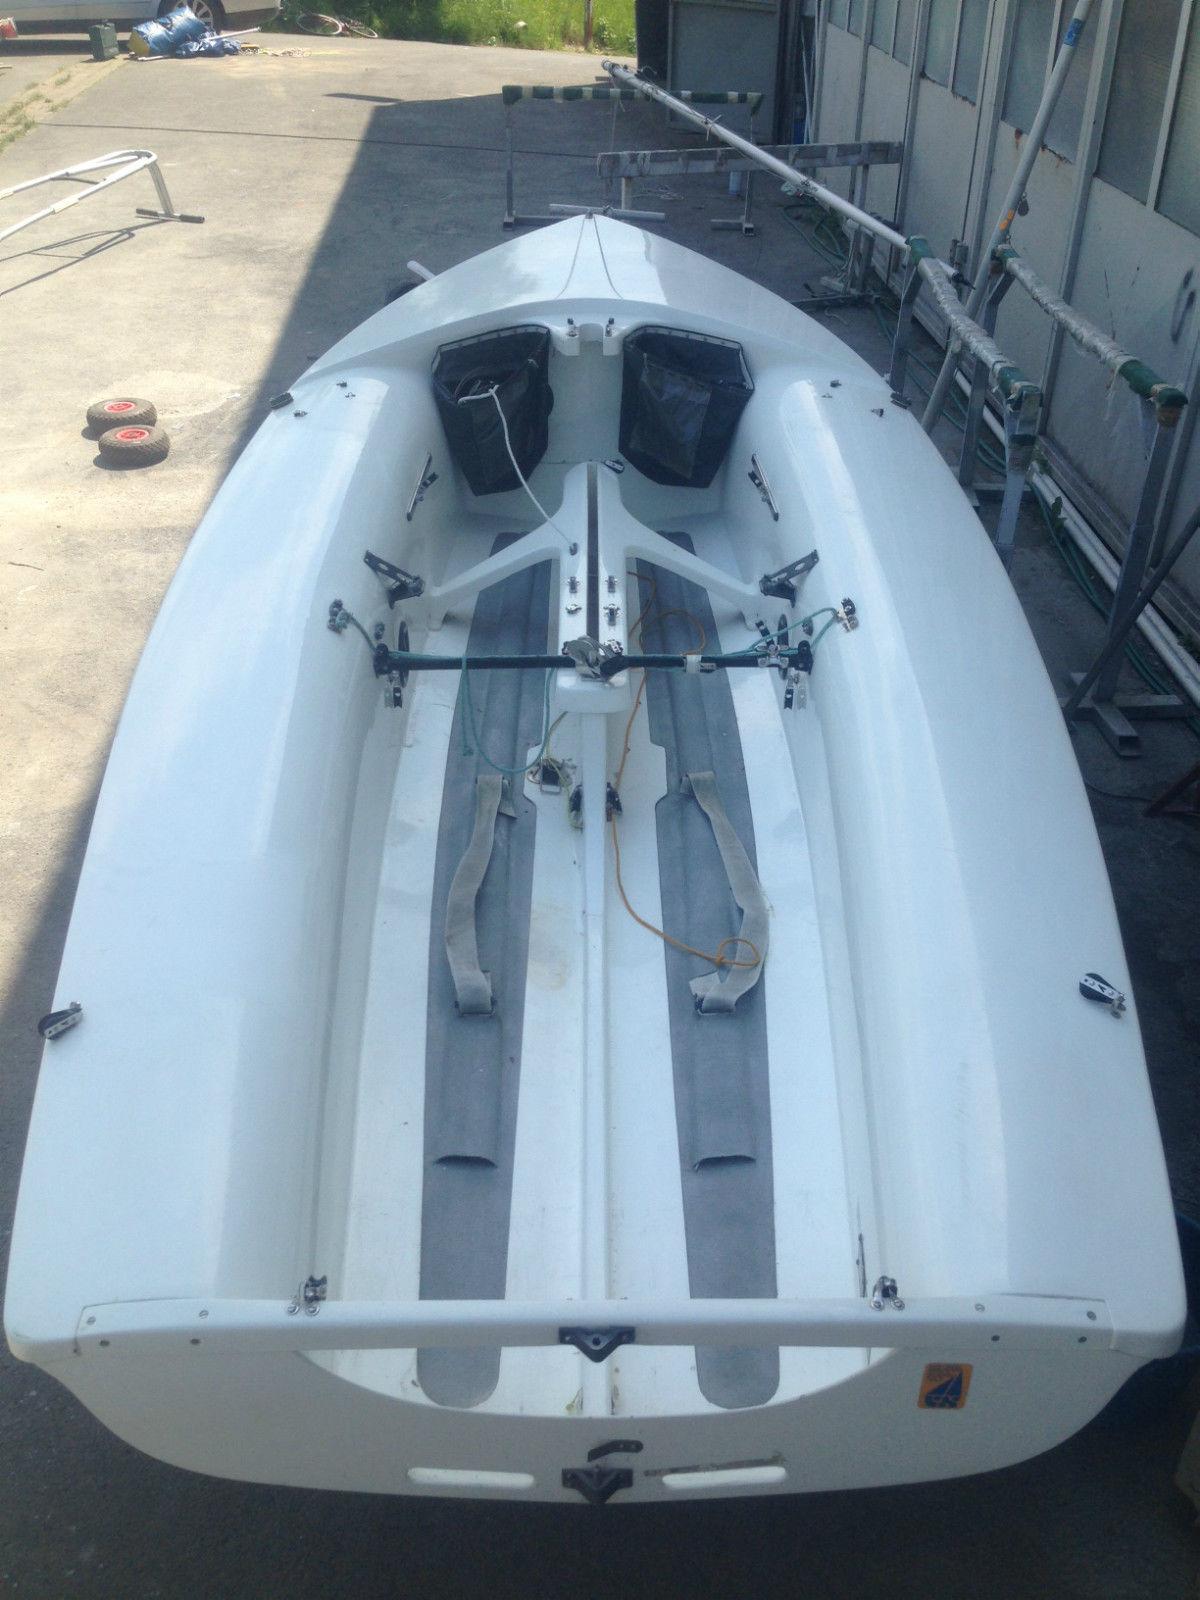 Segelboot 470 PARKER, komplett überholt, sehr guter Zustand